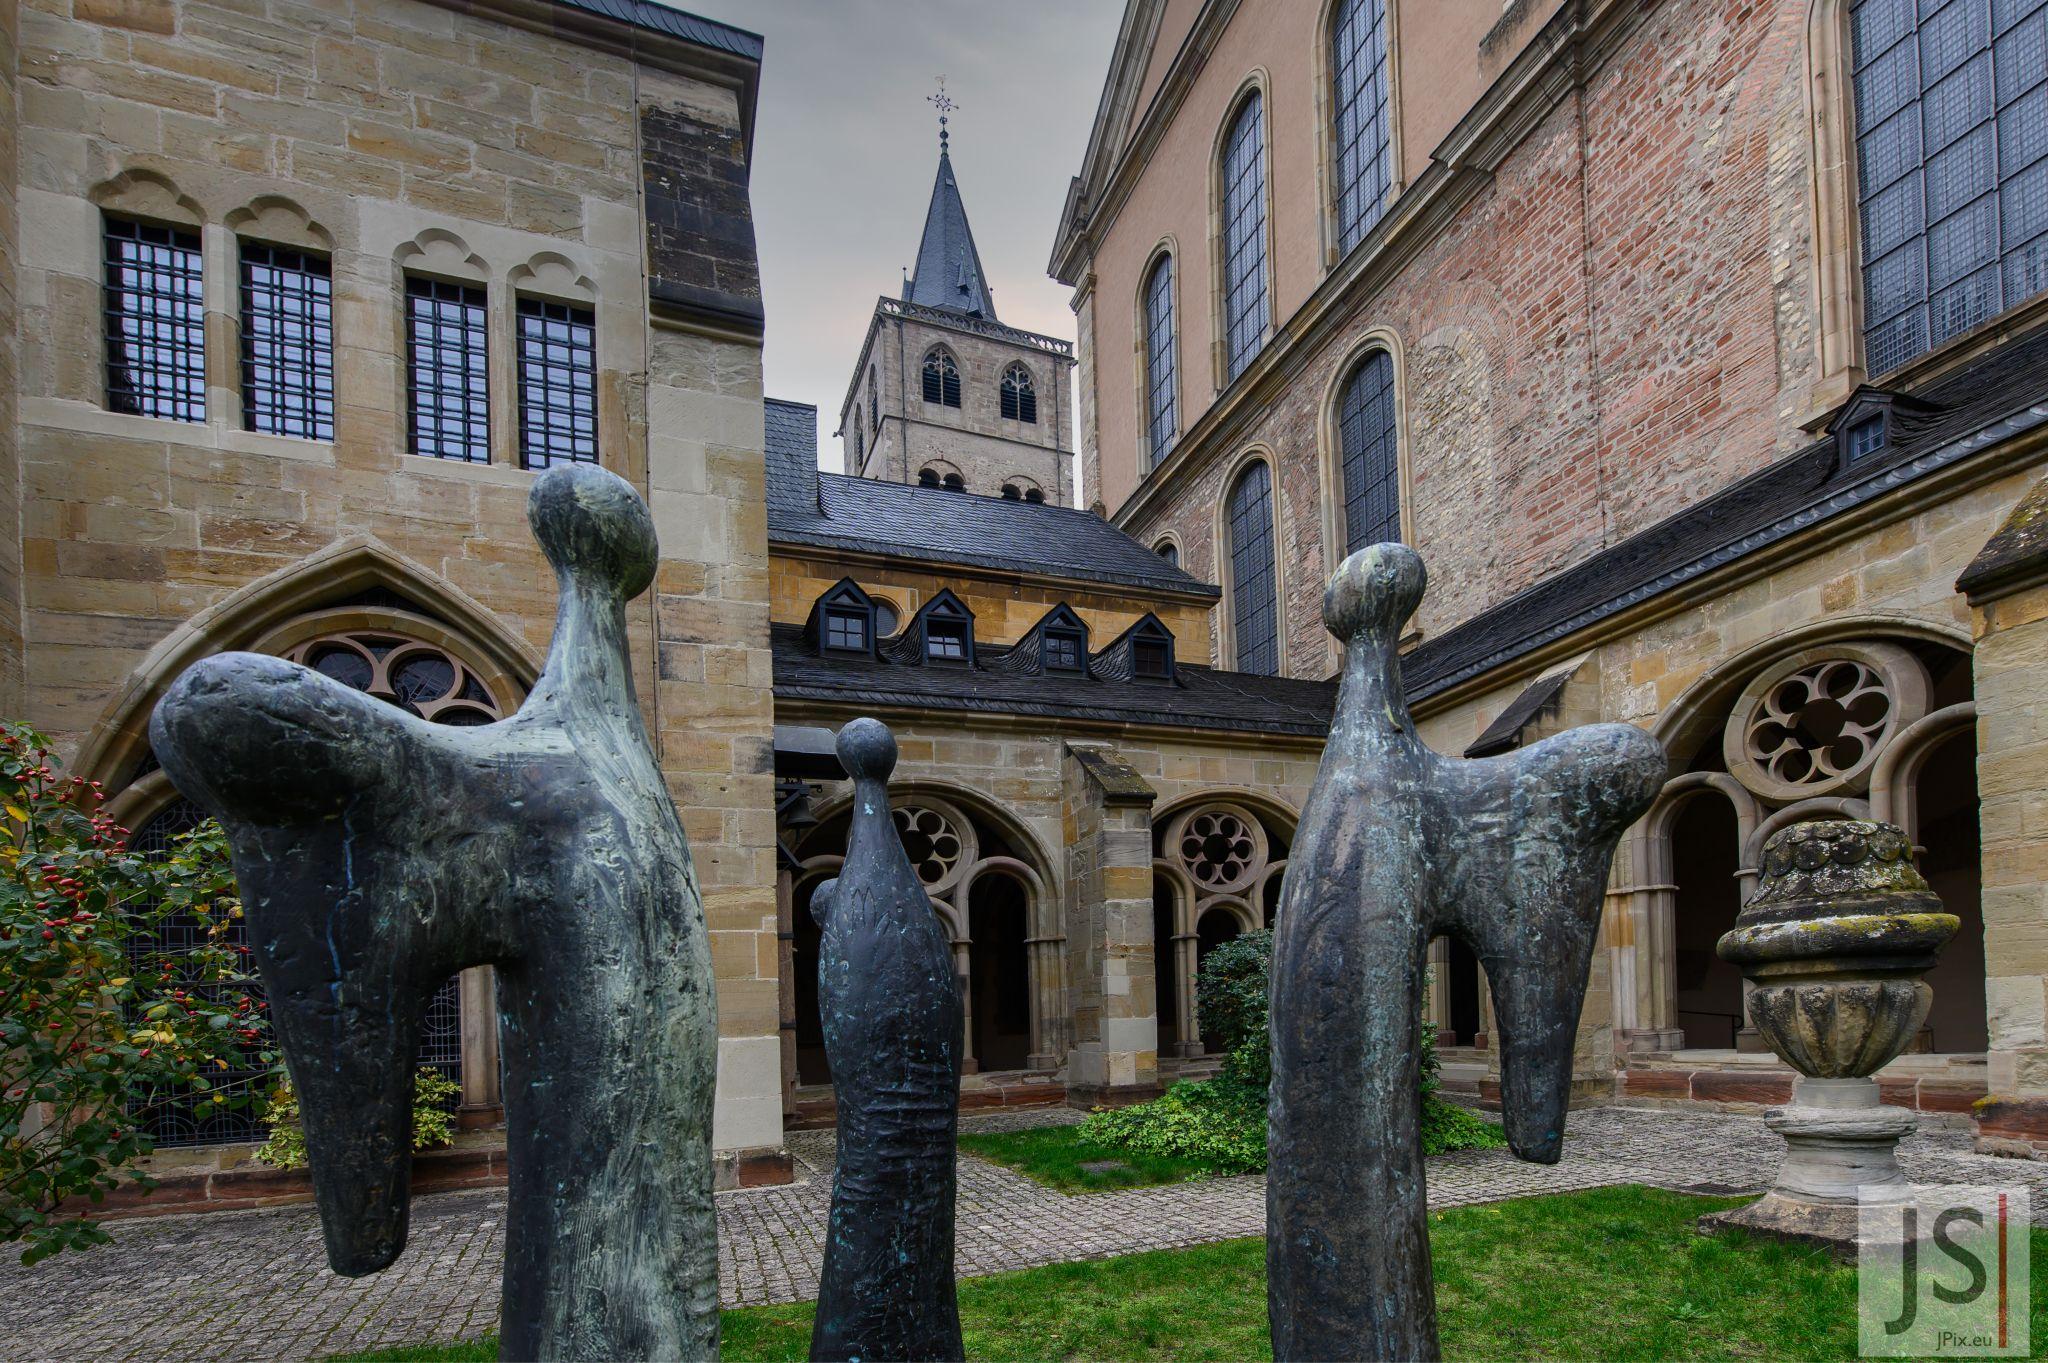 Drei Engel, Domkreuzgang, Trier, Germany